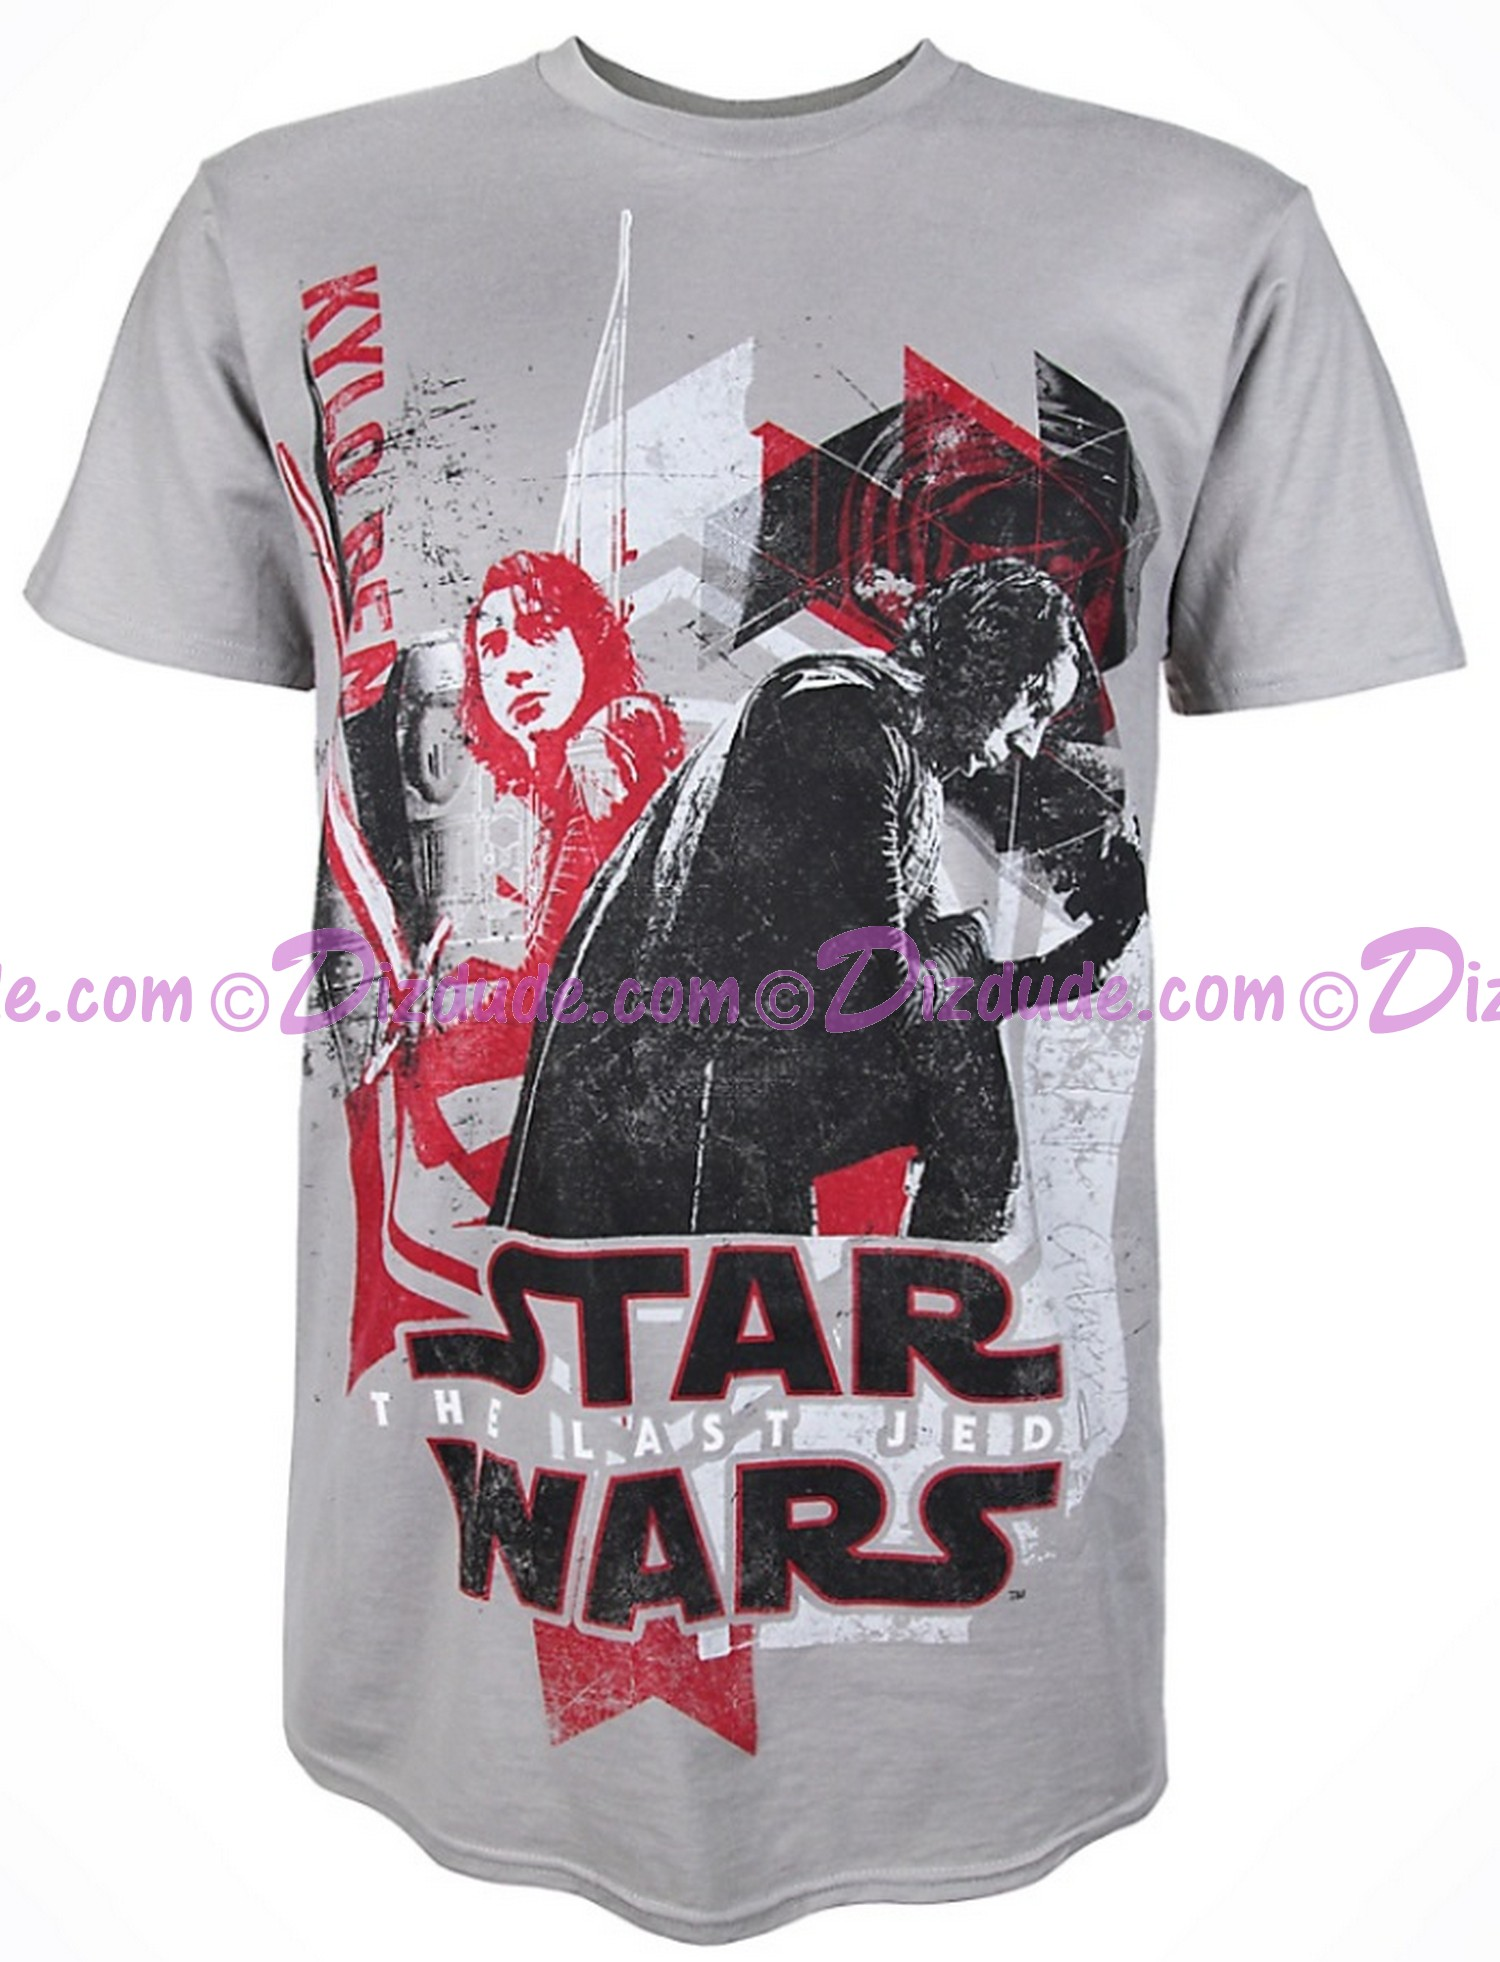 Kylo Ren Adult T-Shirt (Tshirt, T shirt or Tee) - Disney Star Wars Episode VIII: The Last Jedi  © Dizdude.com